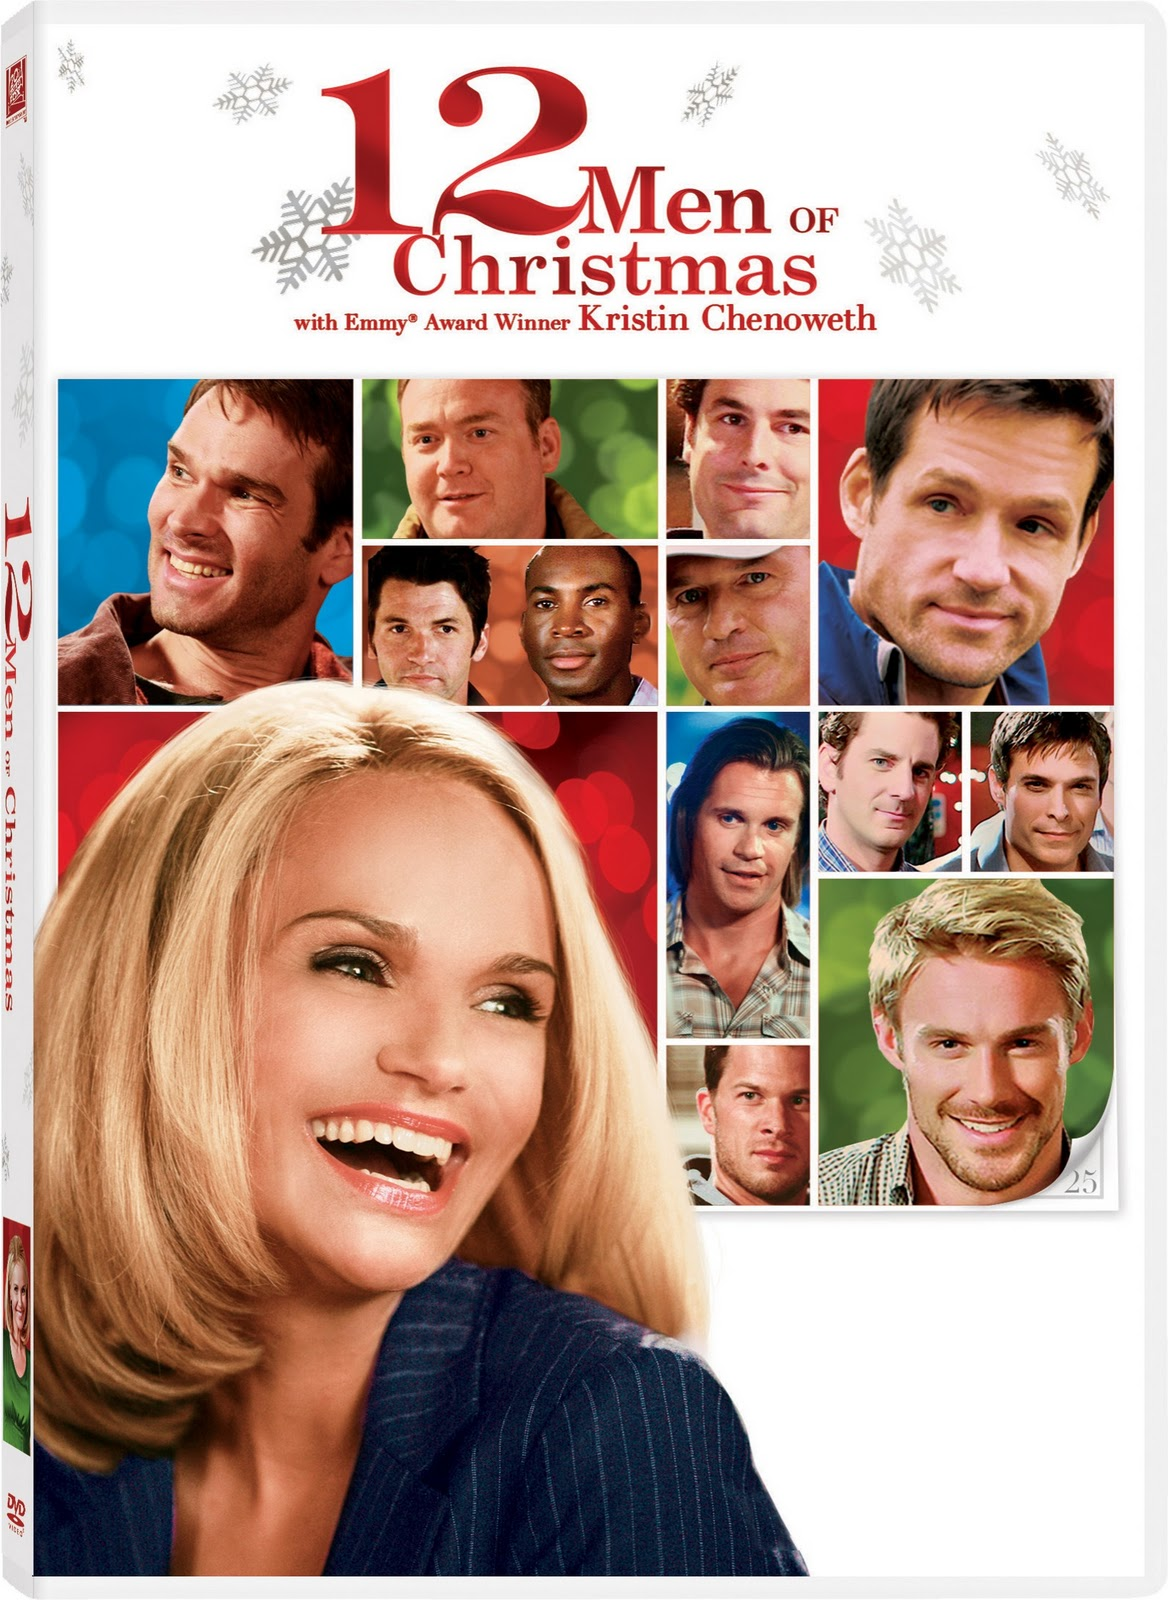 Win a copy of 12 Men of Christmas on DVD! | DVDLEGION.COM - DVD ...